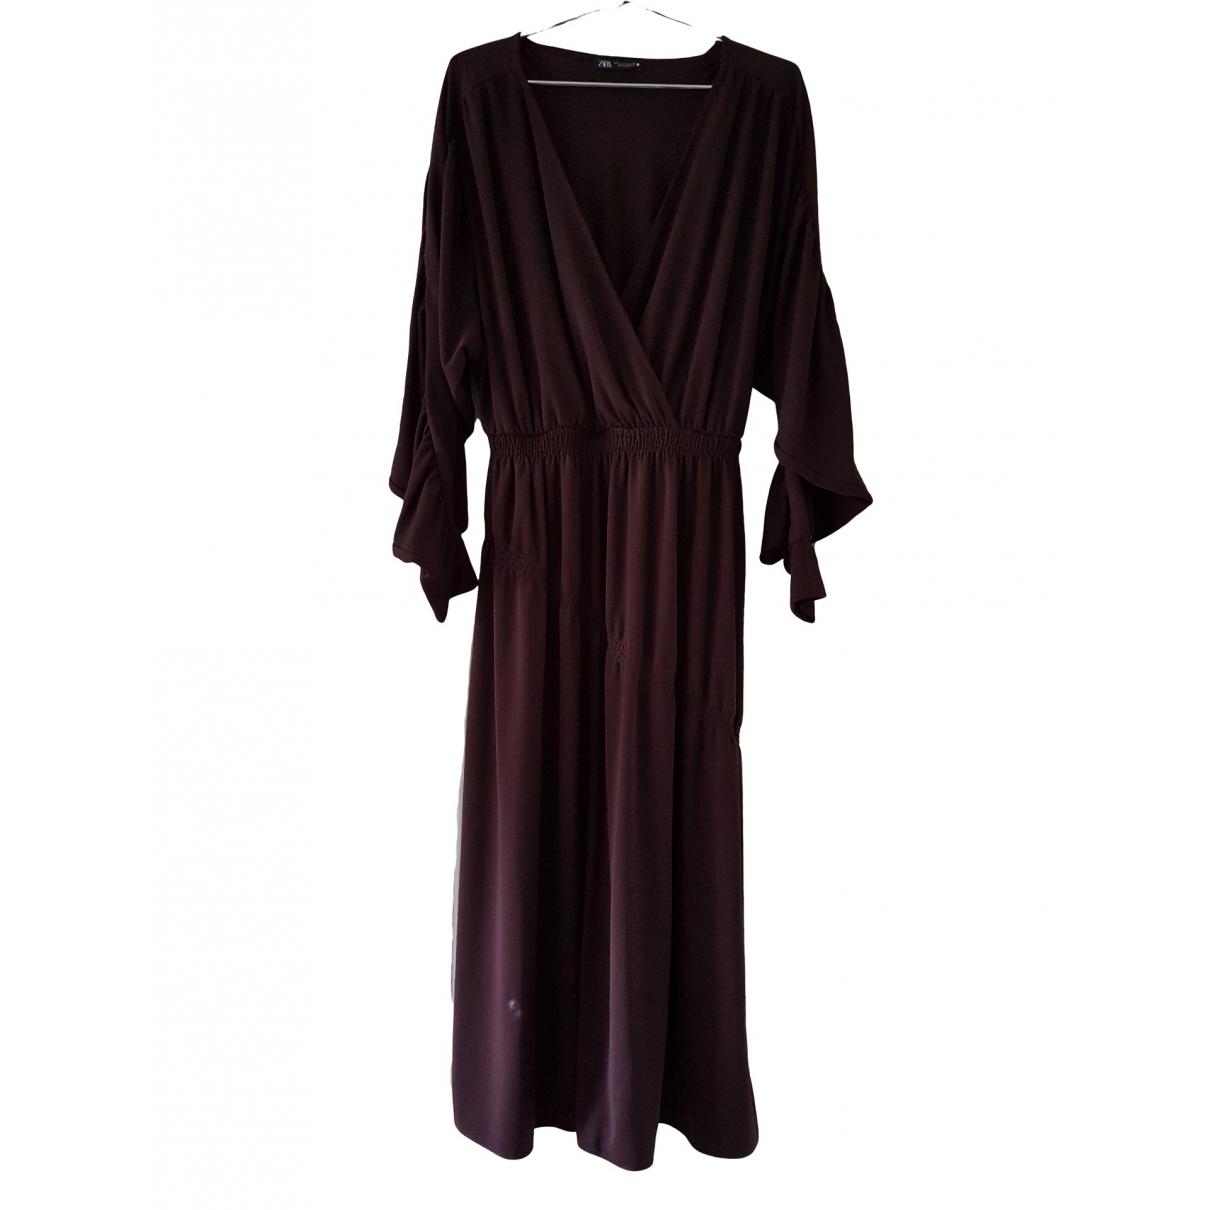 Zara \N Kleid in  Braun Polyester